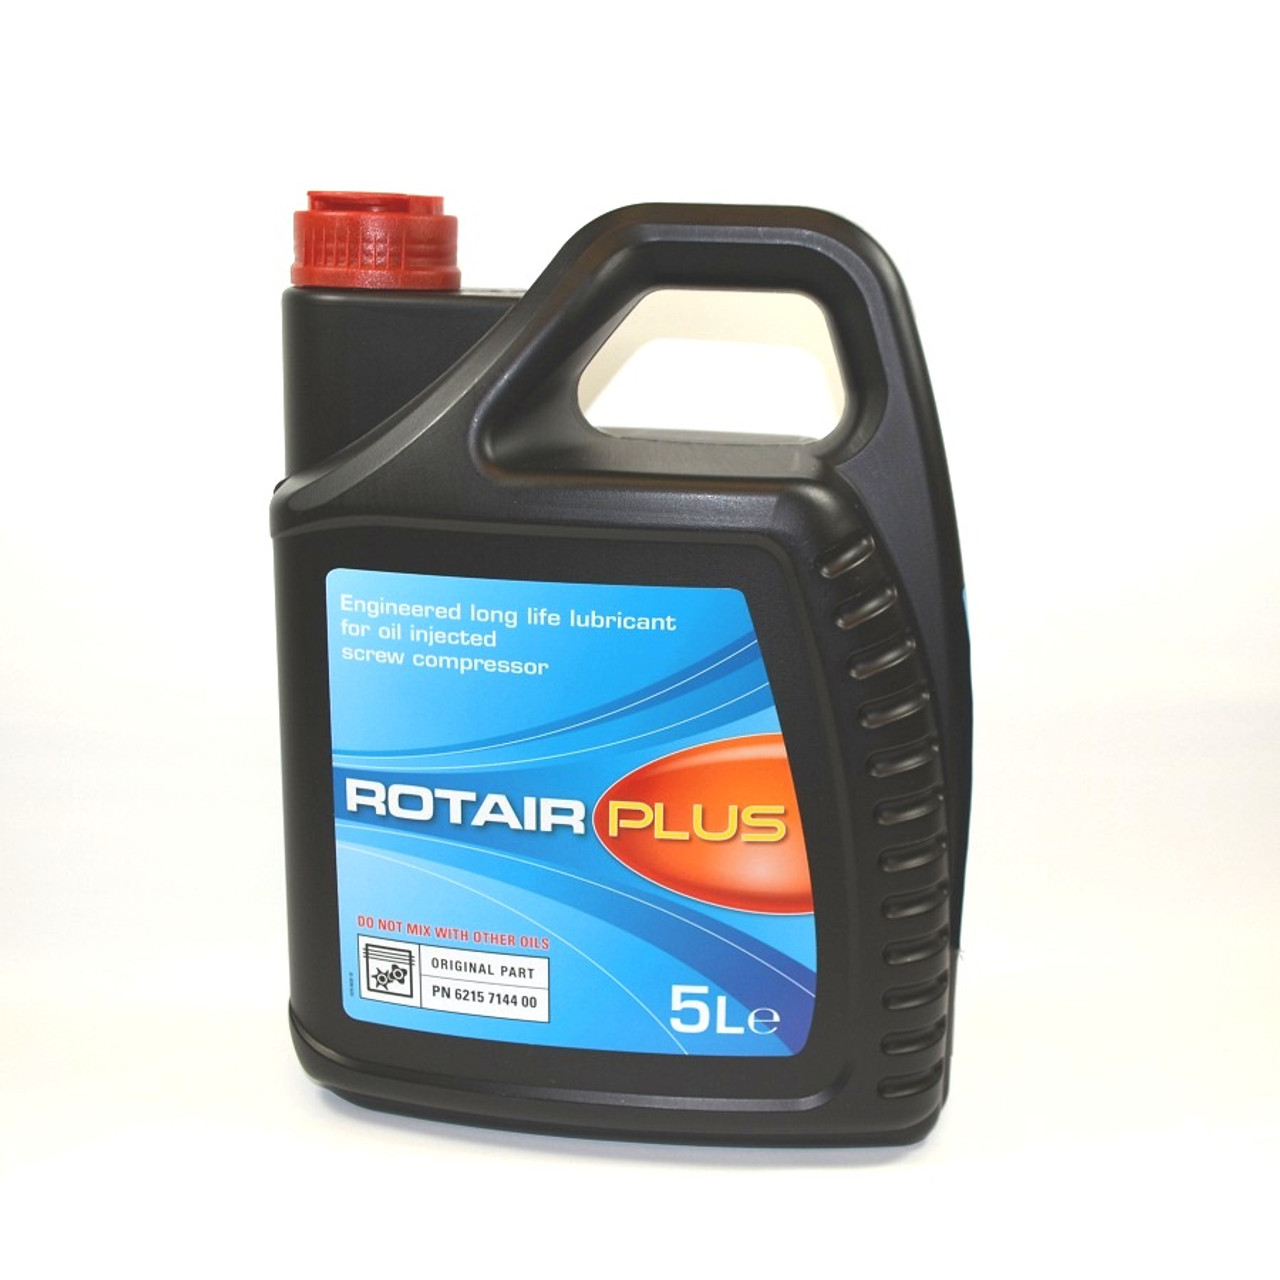 6215714400 Rotair Plus 4000 Hour Compressor Lubricant. 5 liter / 1.32 gallon